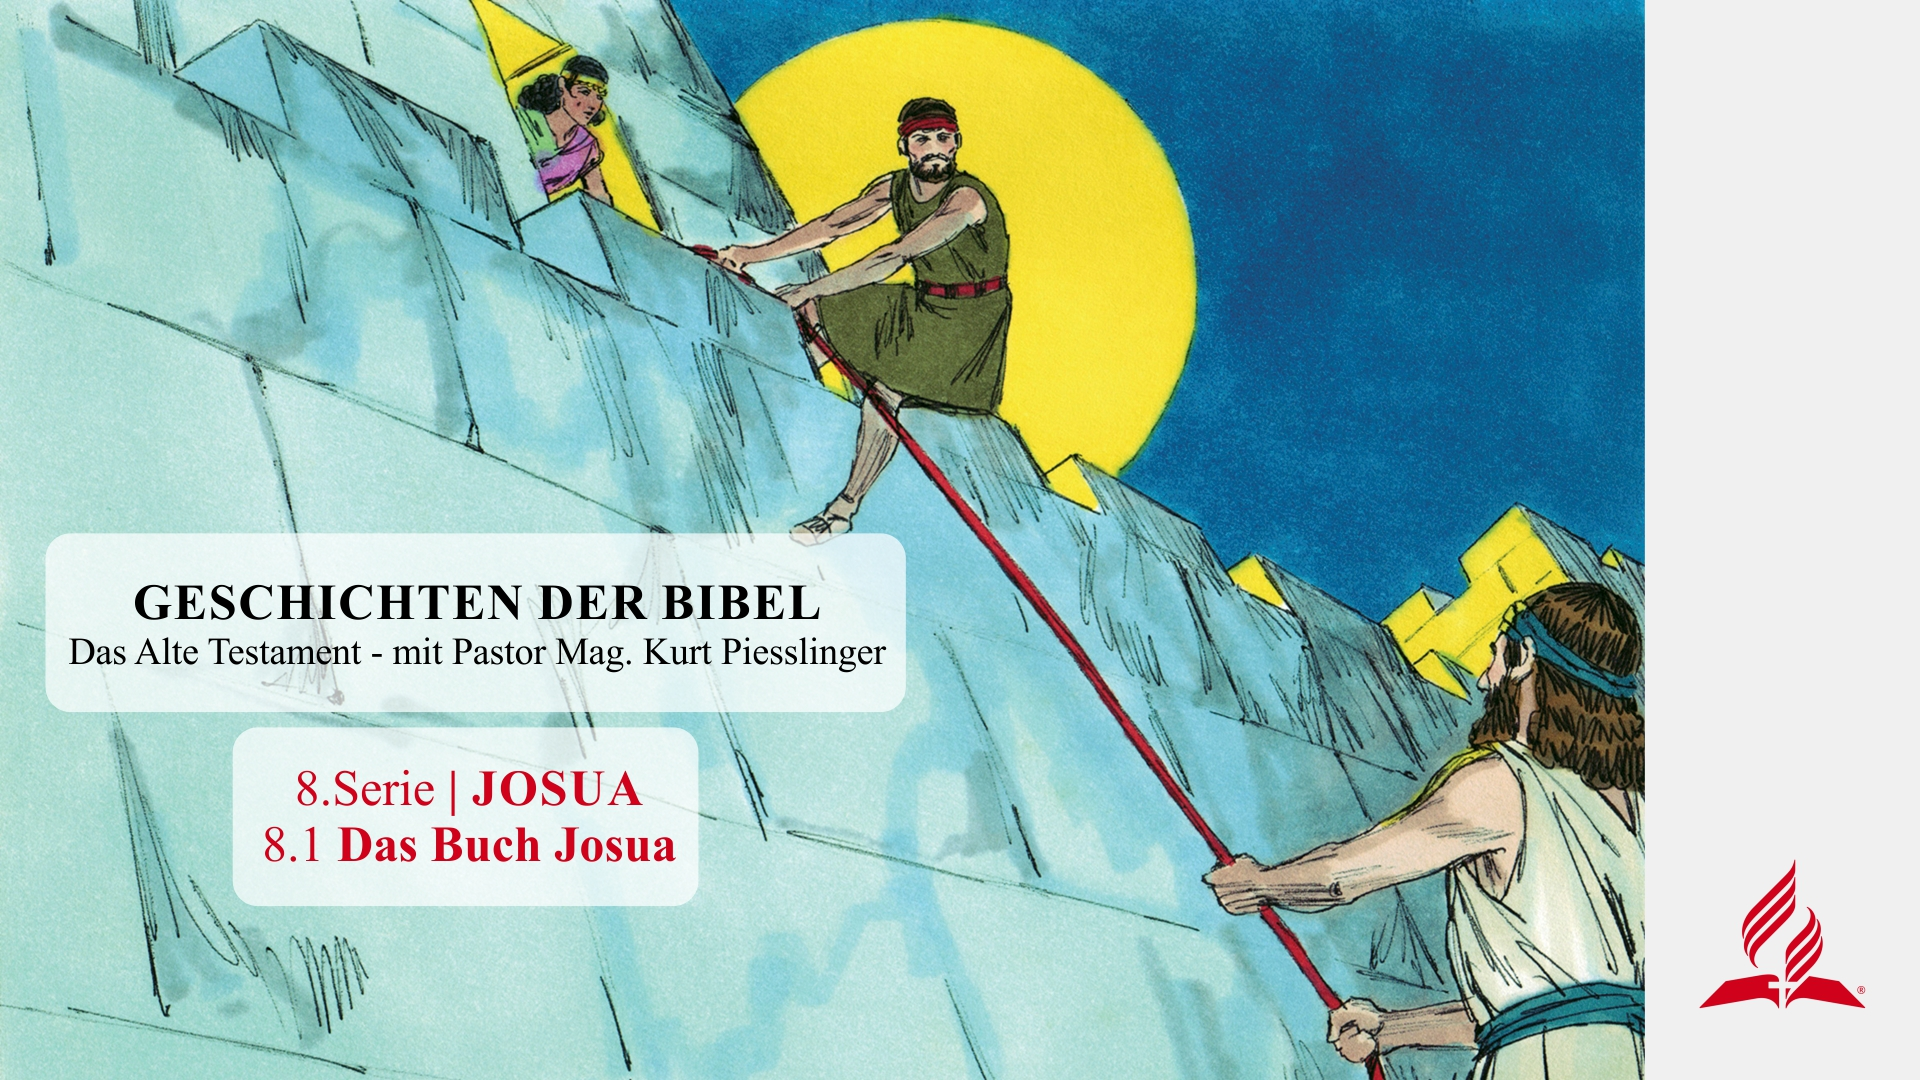 8.1 Das Buch Josua x